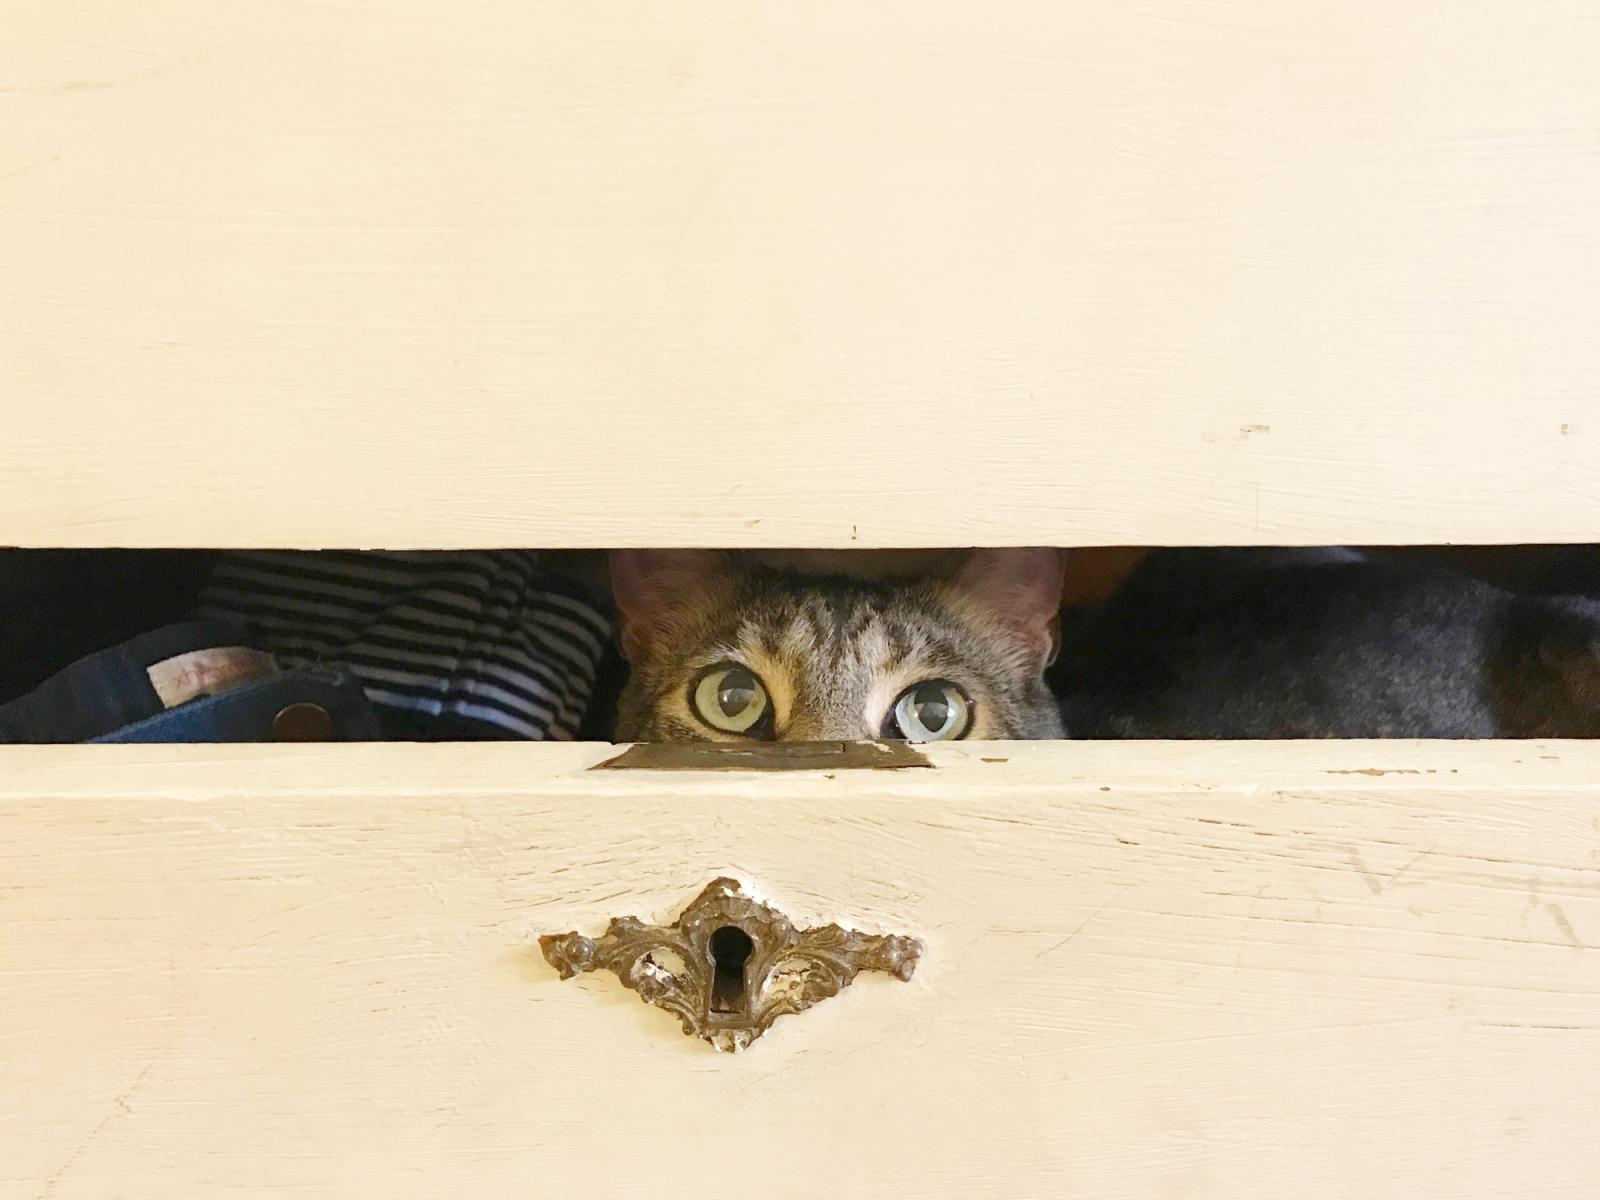 hiding-kitty-kitty.jpg